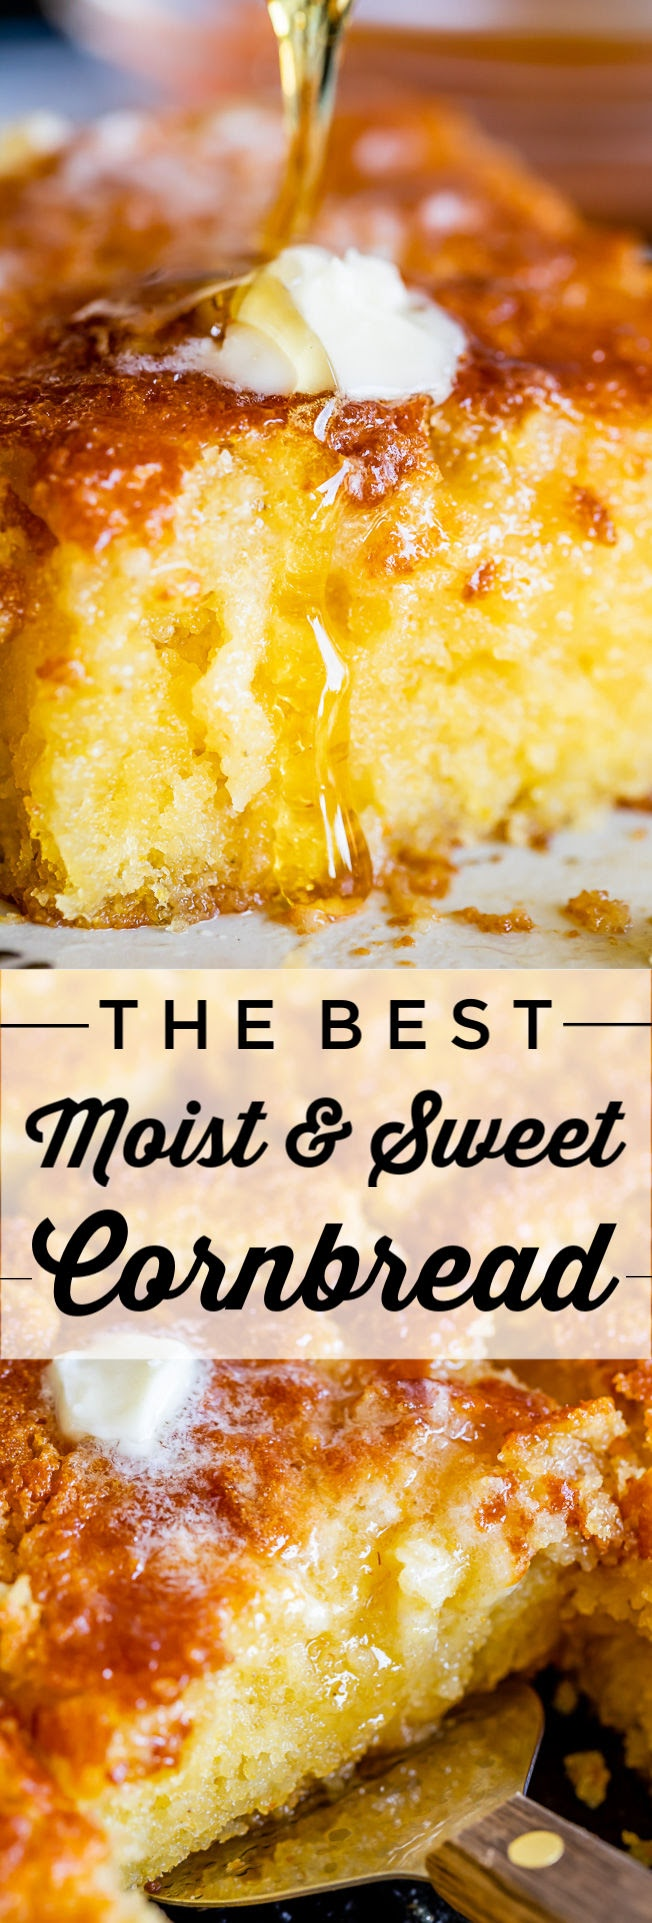 Sweet and Moist Honey Cornbread from The Food Charlatan